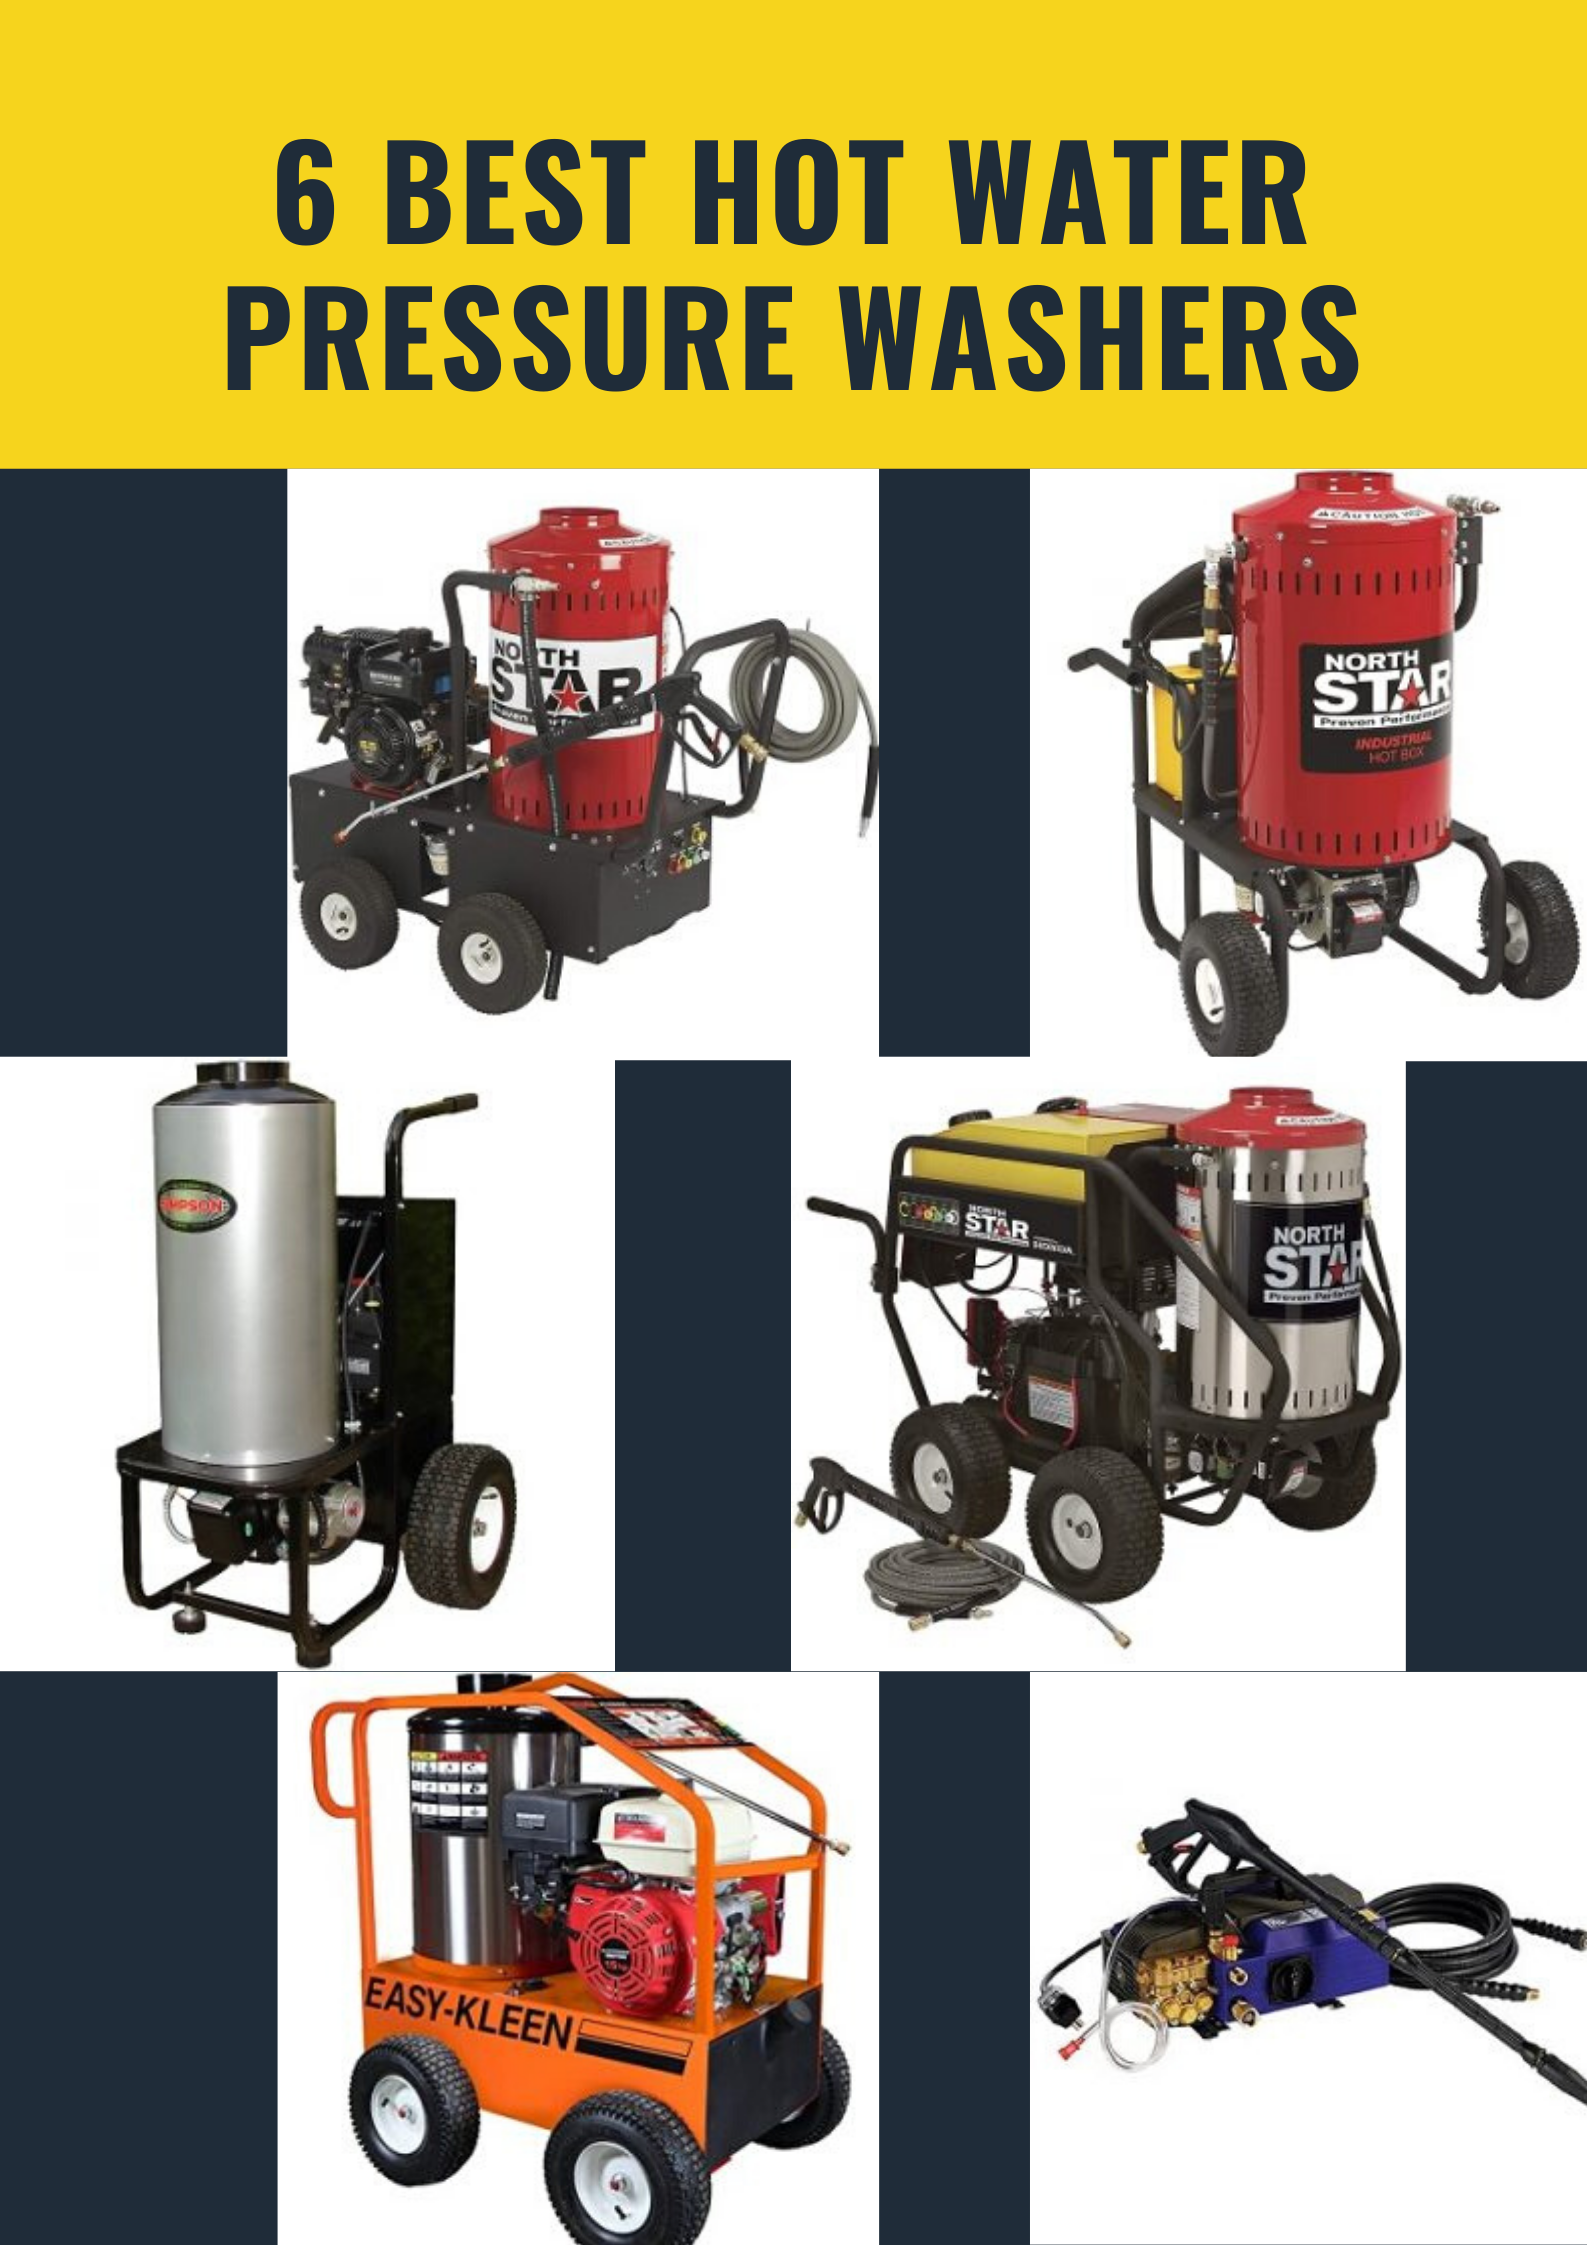 6-Best-Hot-Water-Pressure-Washers